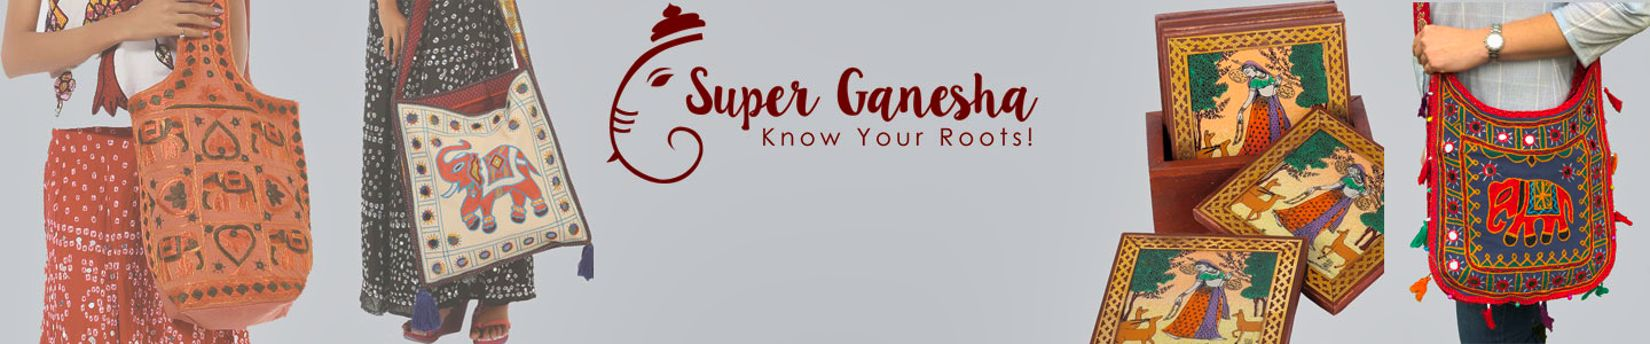 Super Ganesha